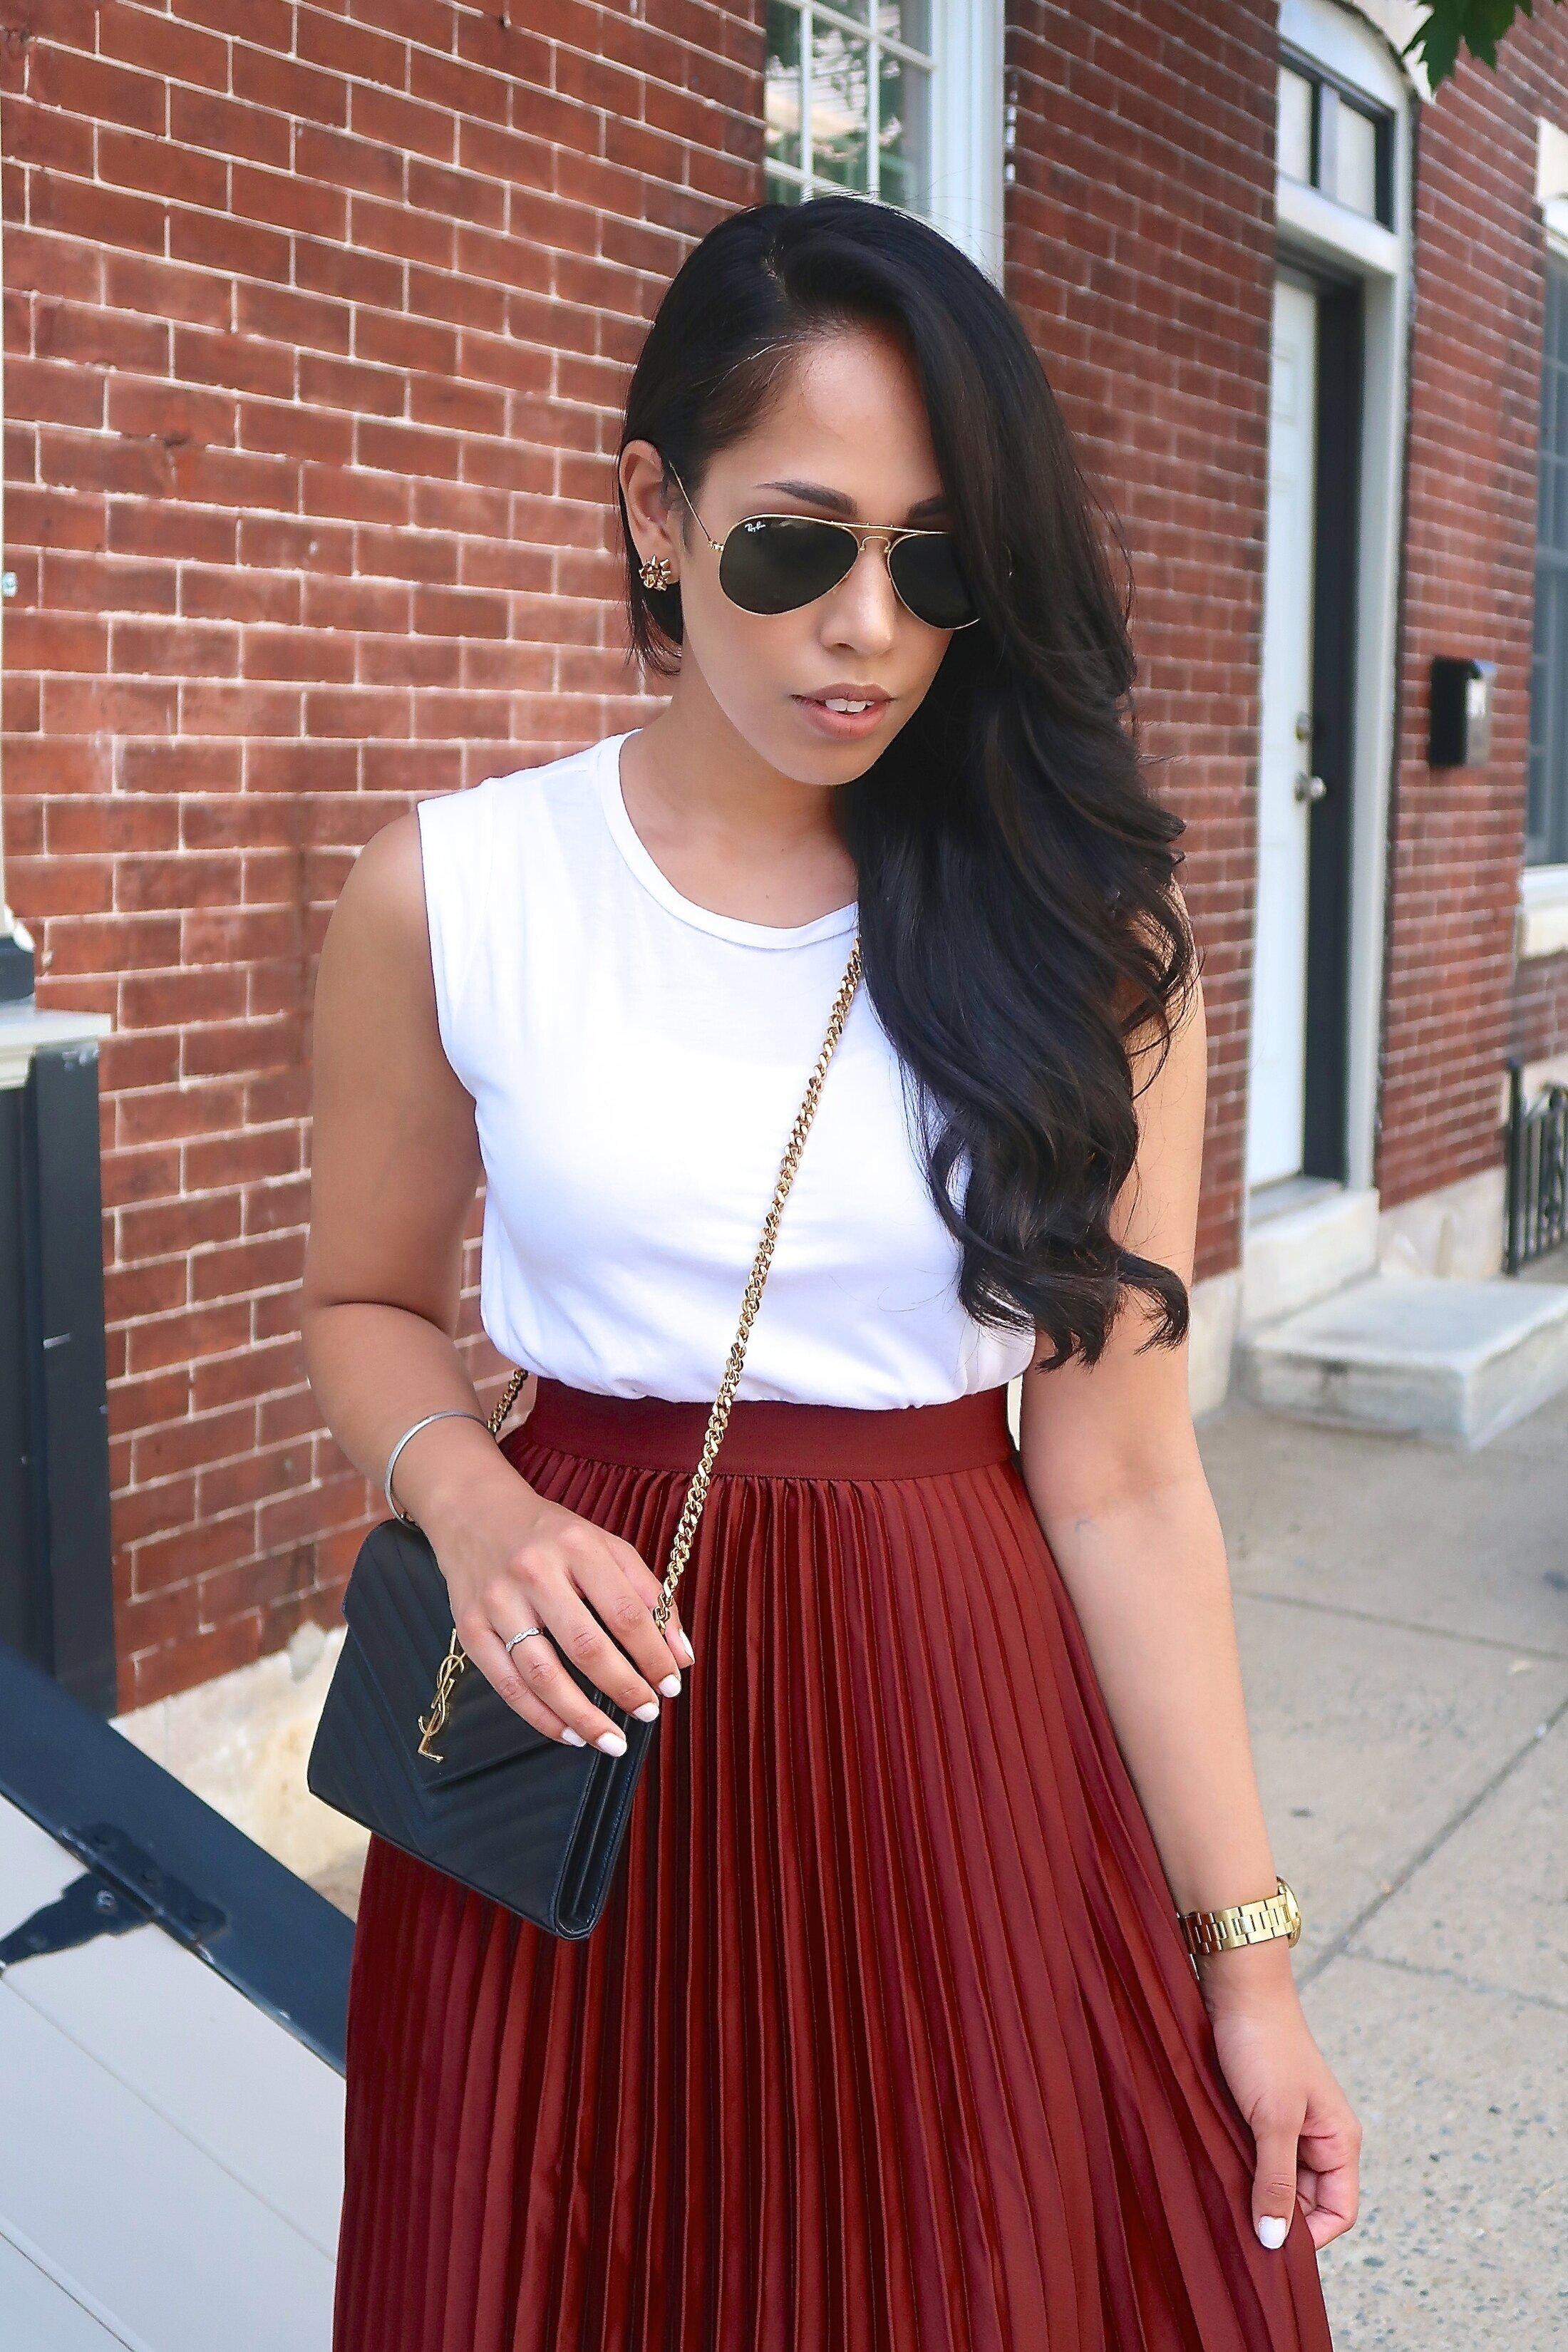 indian-fashion-blogger-philadelphia-mygoldenbeauty.jpg